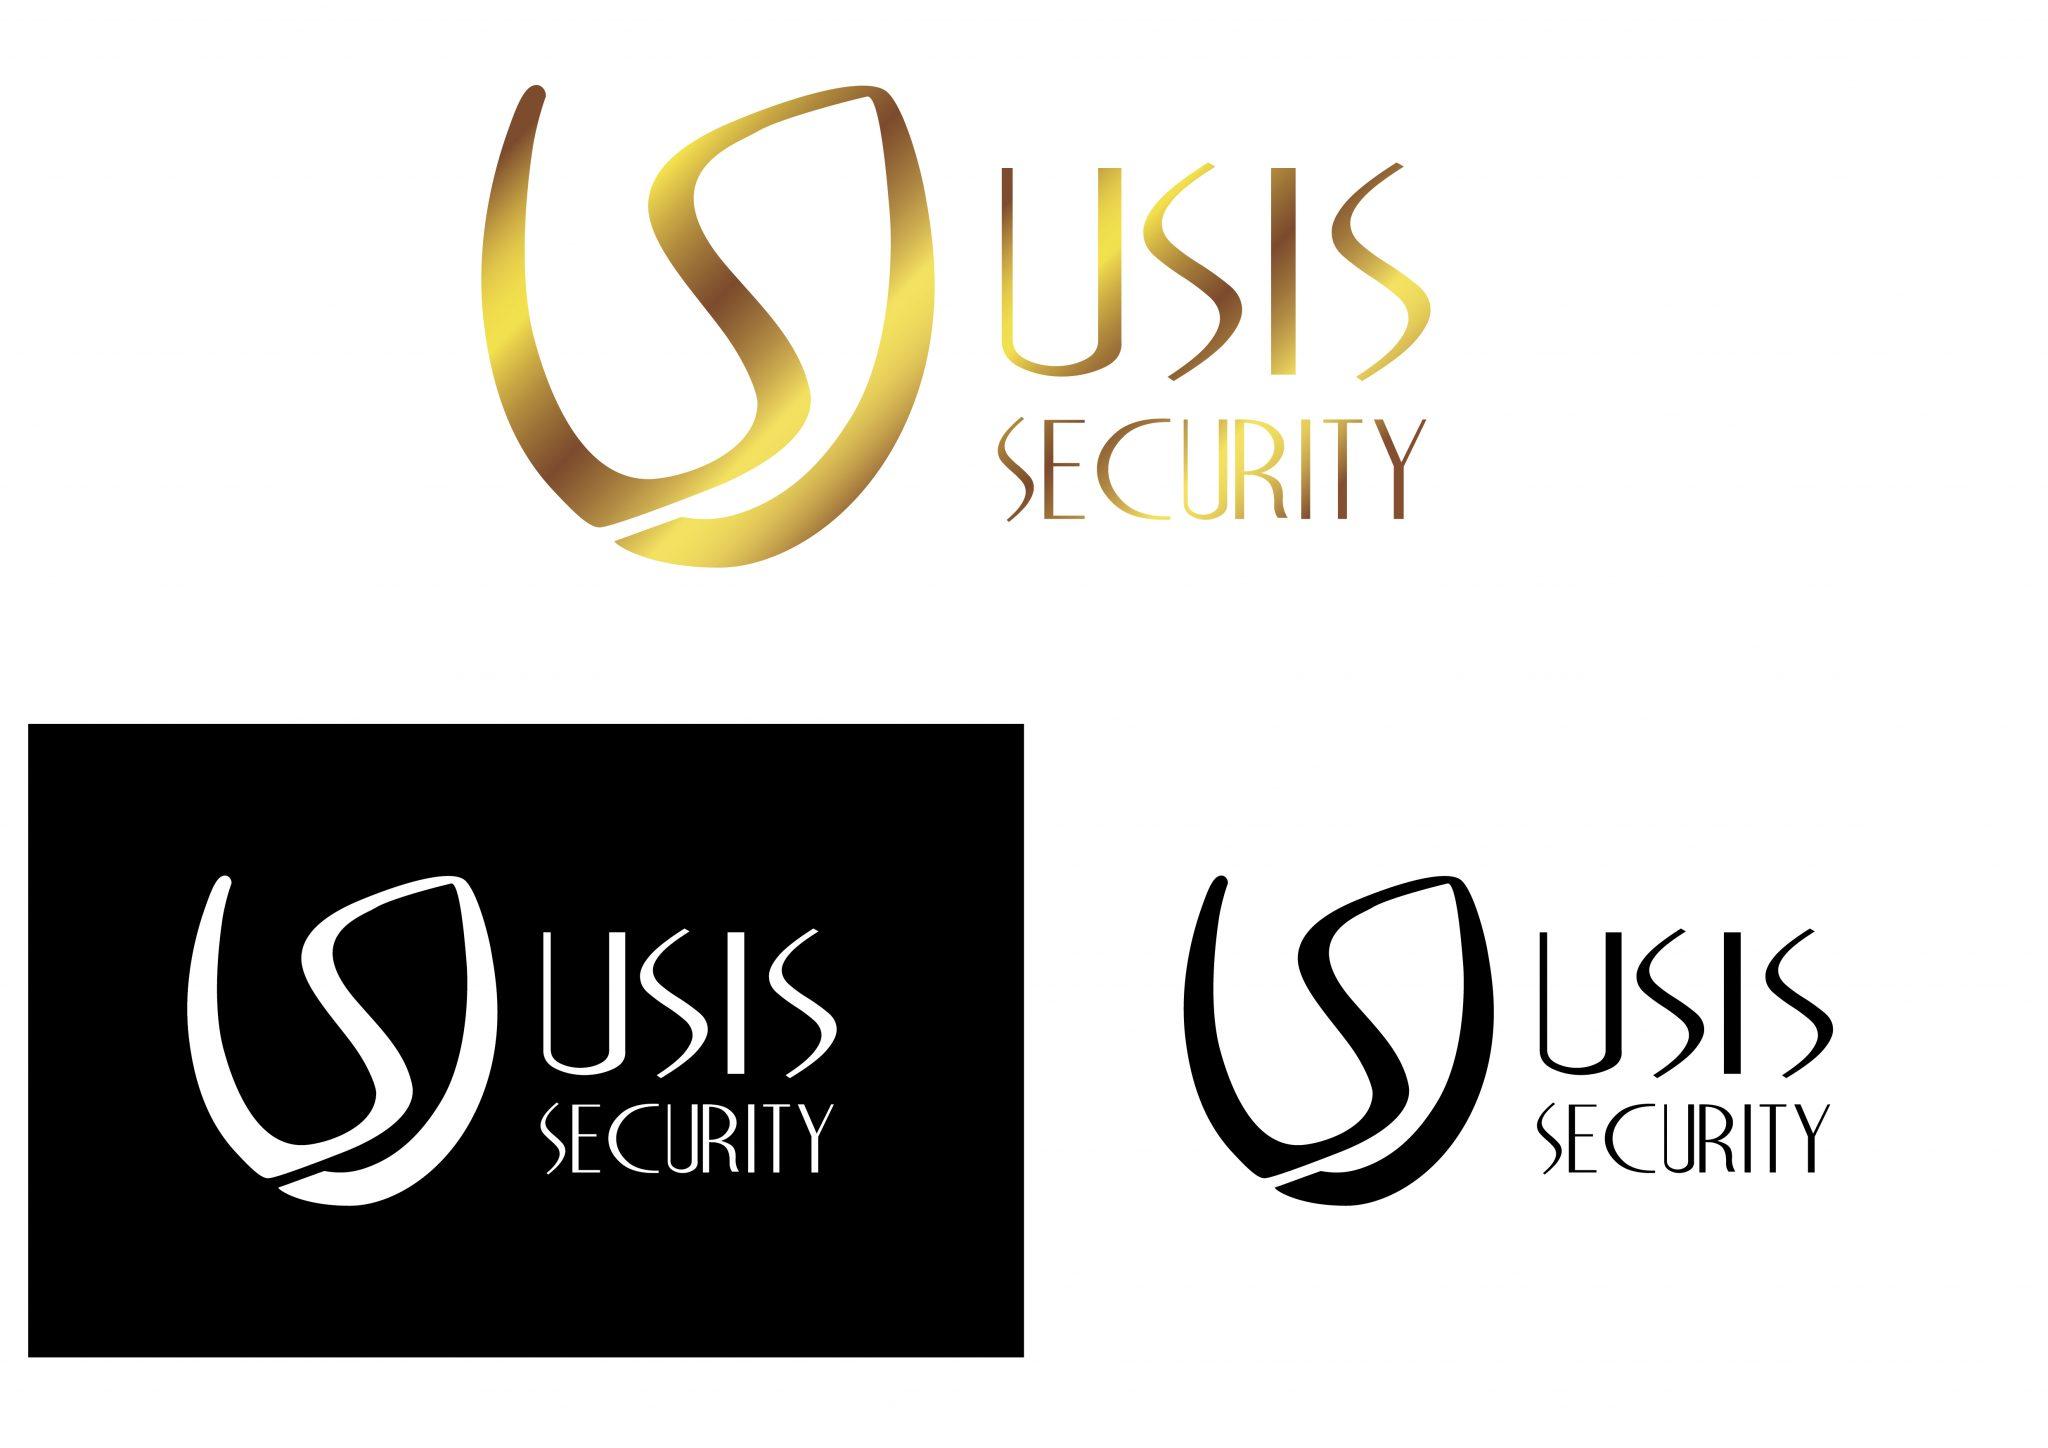 Grafichen dizain - Usis logo